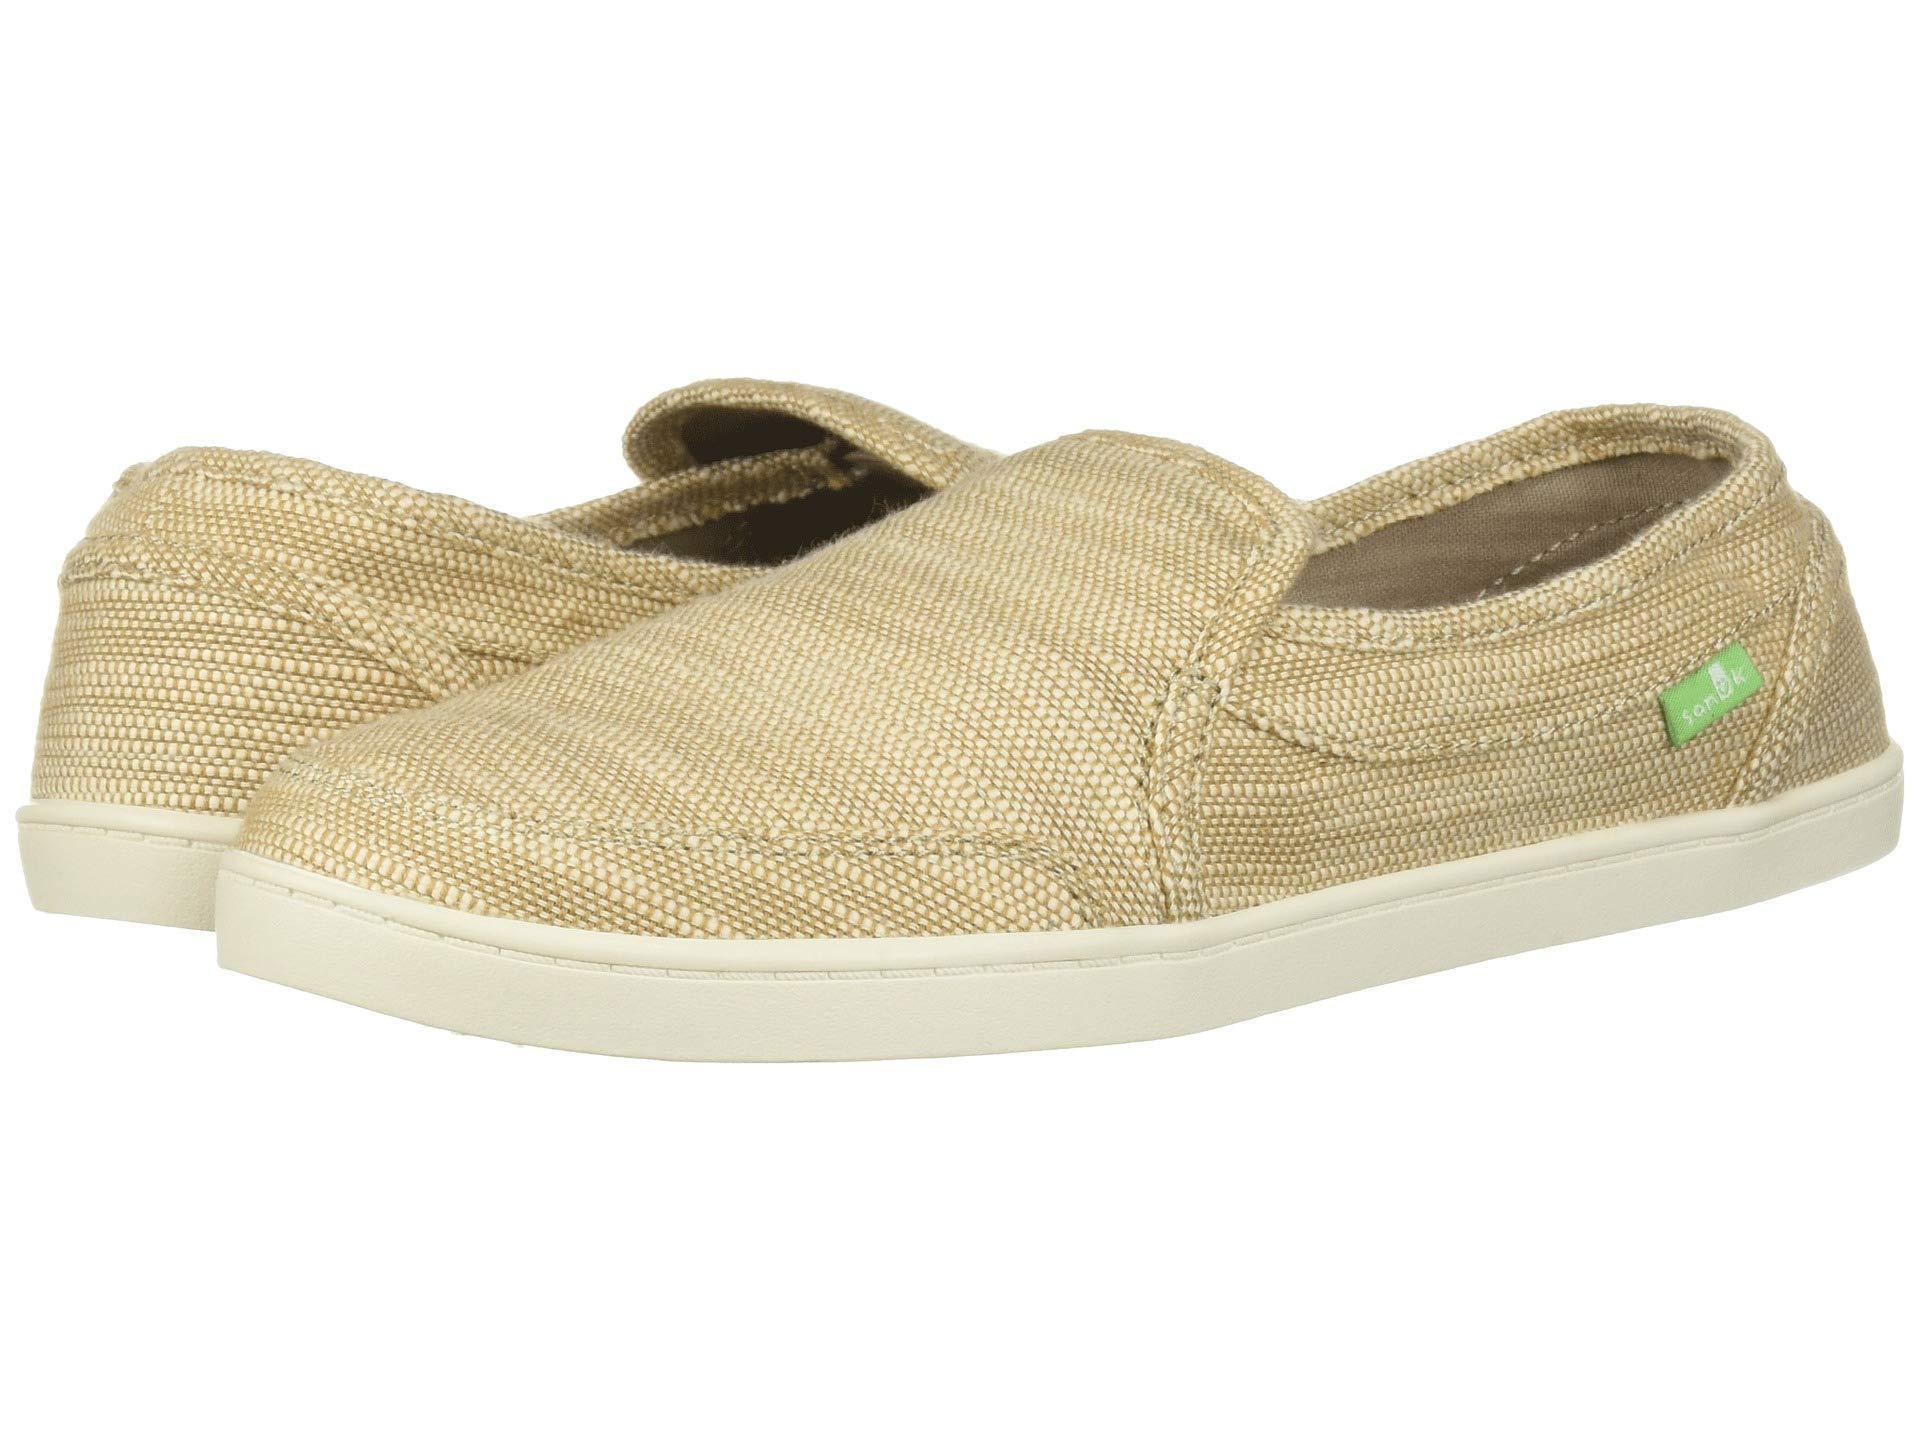 10cff0817efcc Lyst - Sanuk Pair O Dice Hemp (black) Women s Slip On Shoes in Natural